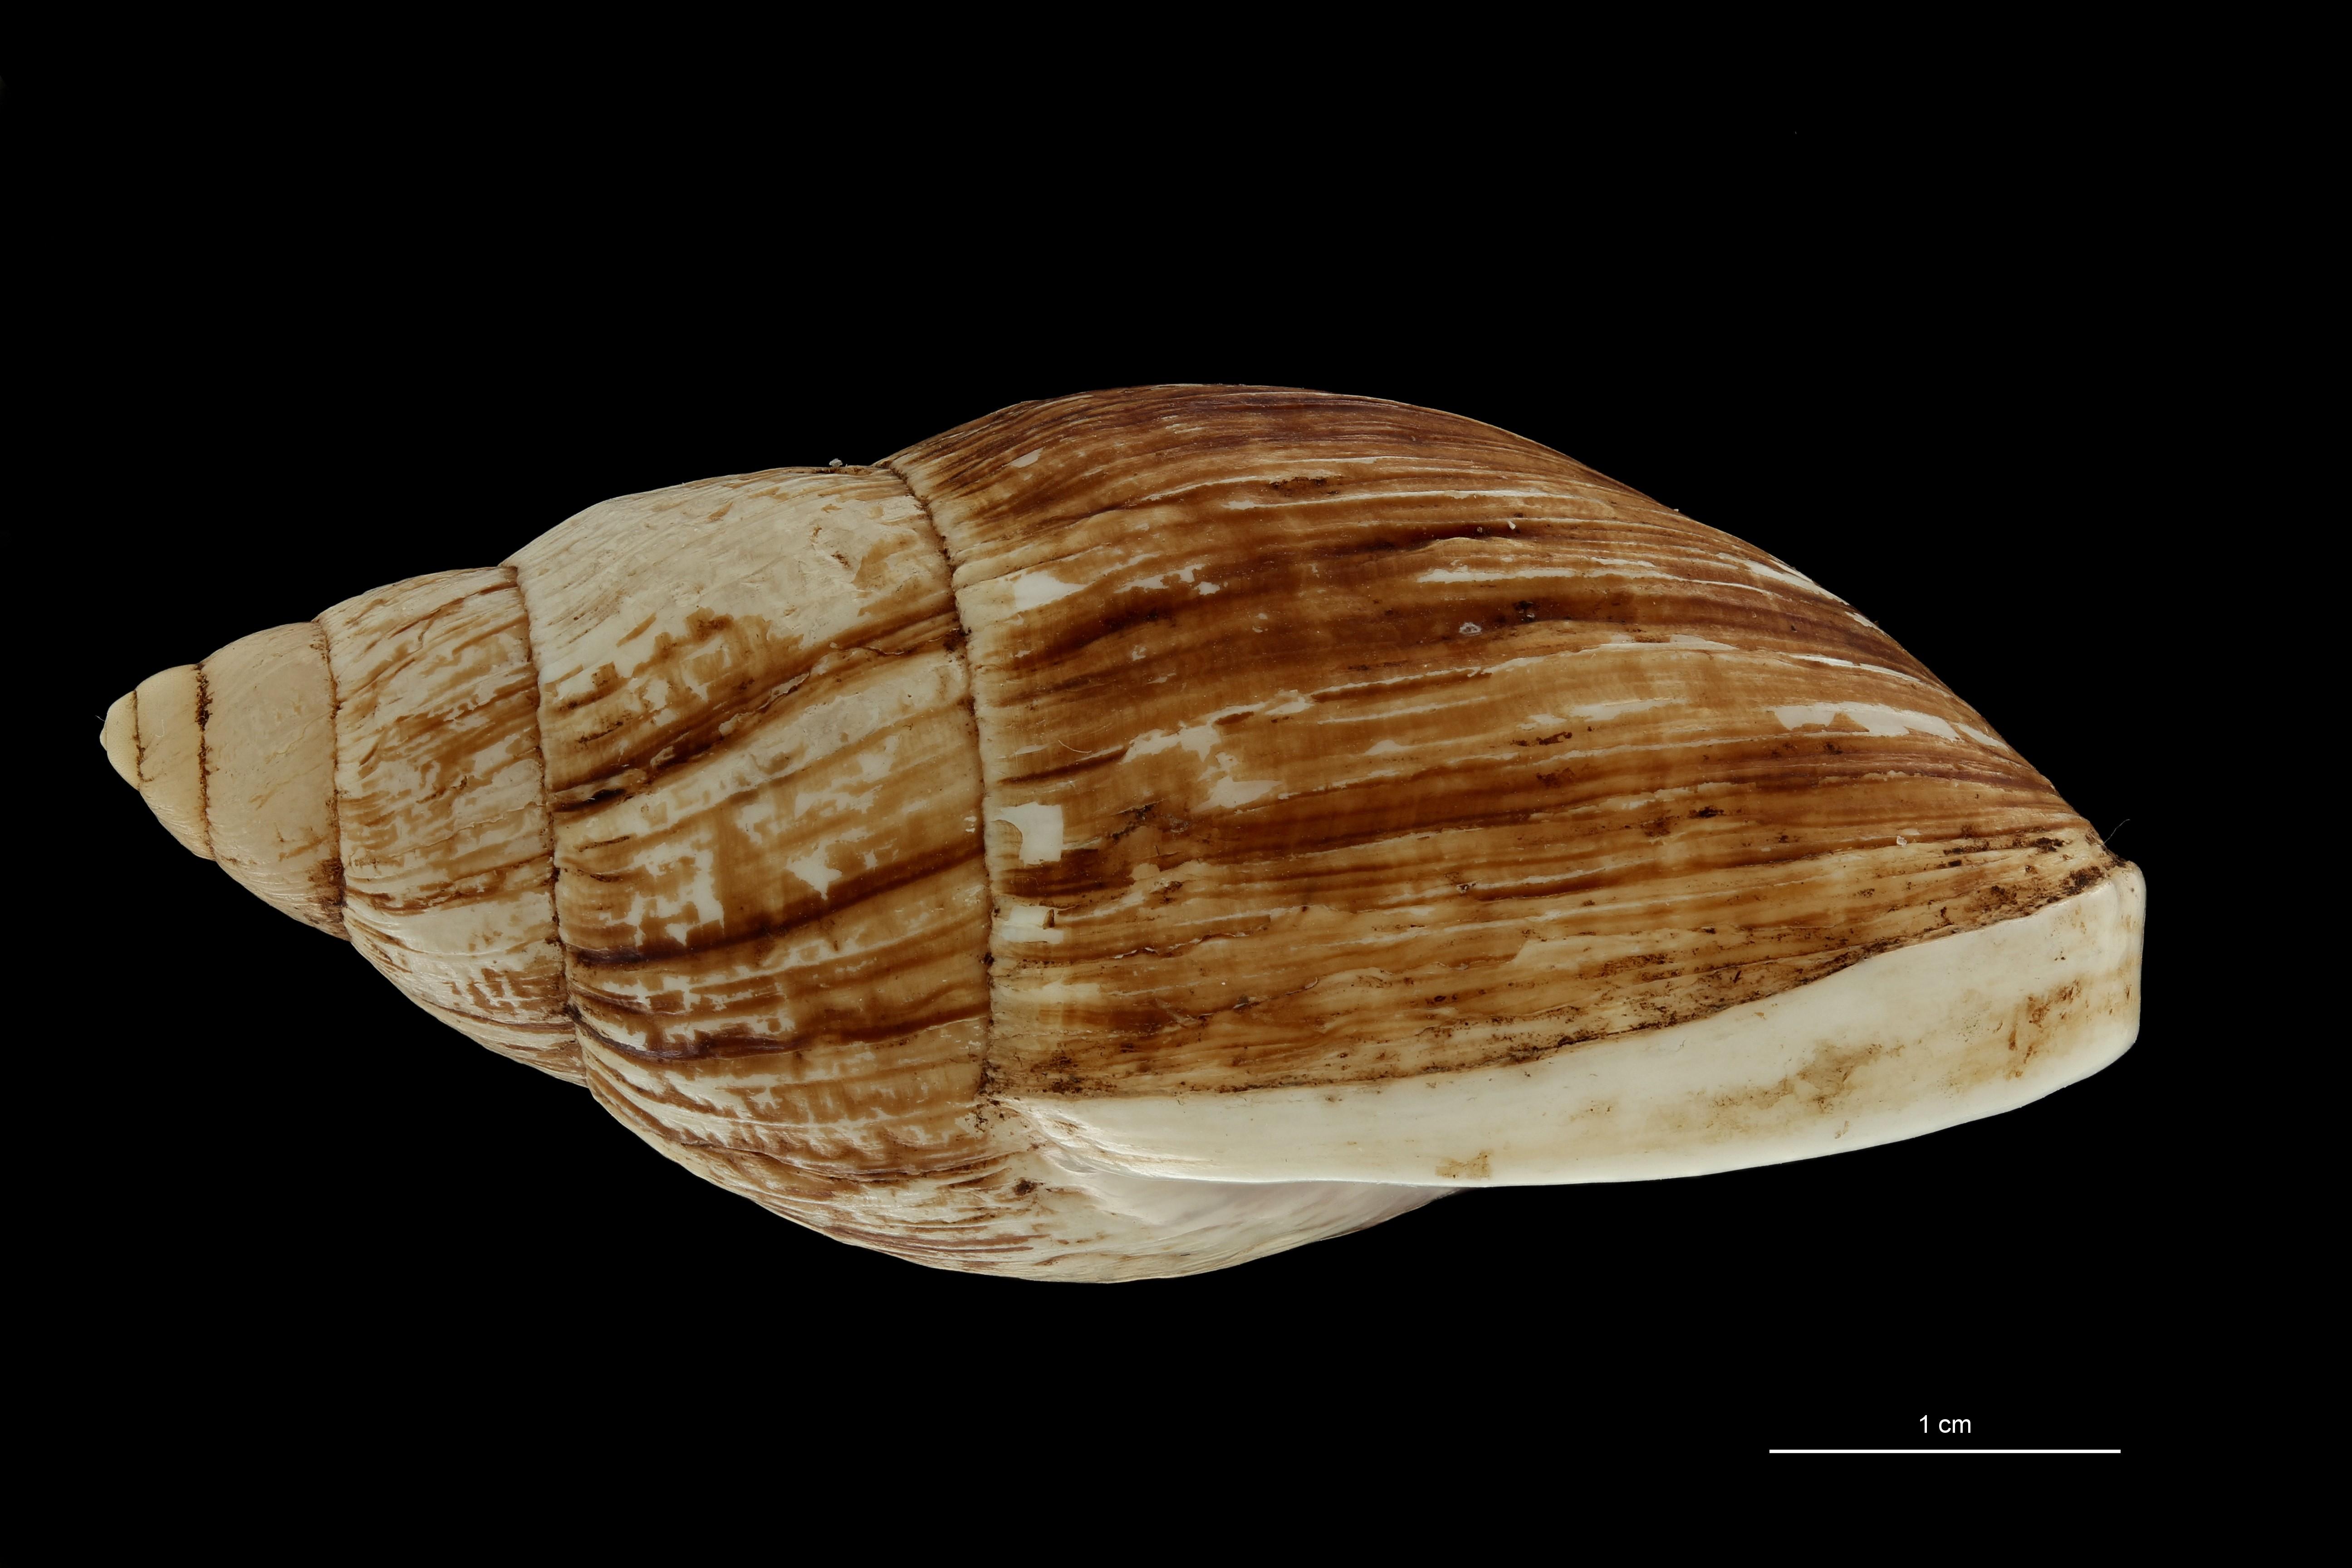 BE-RBINS-INV MT 703 Placostylus porphyrostomus var. nana Type L ZS PMax Scaled.jpg